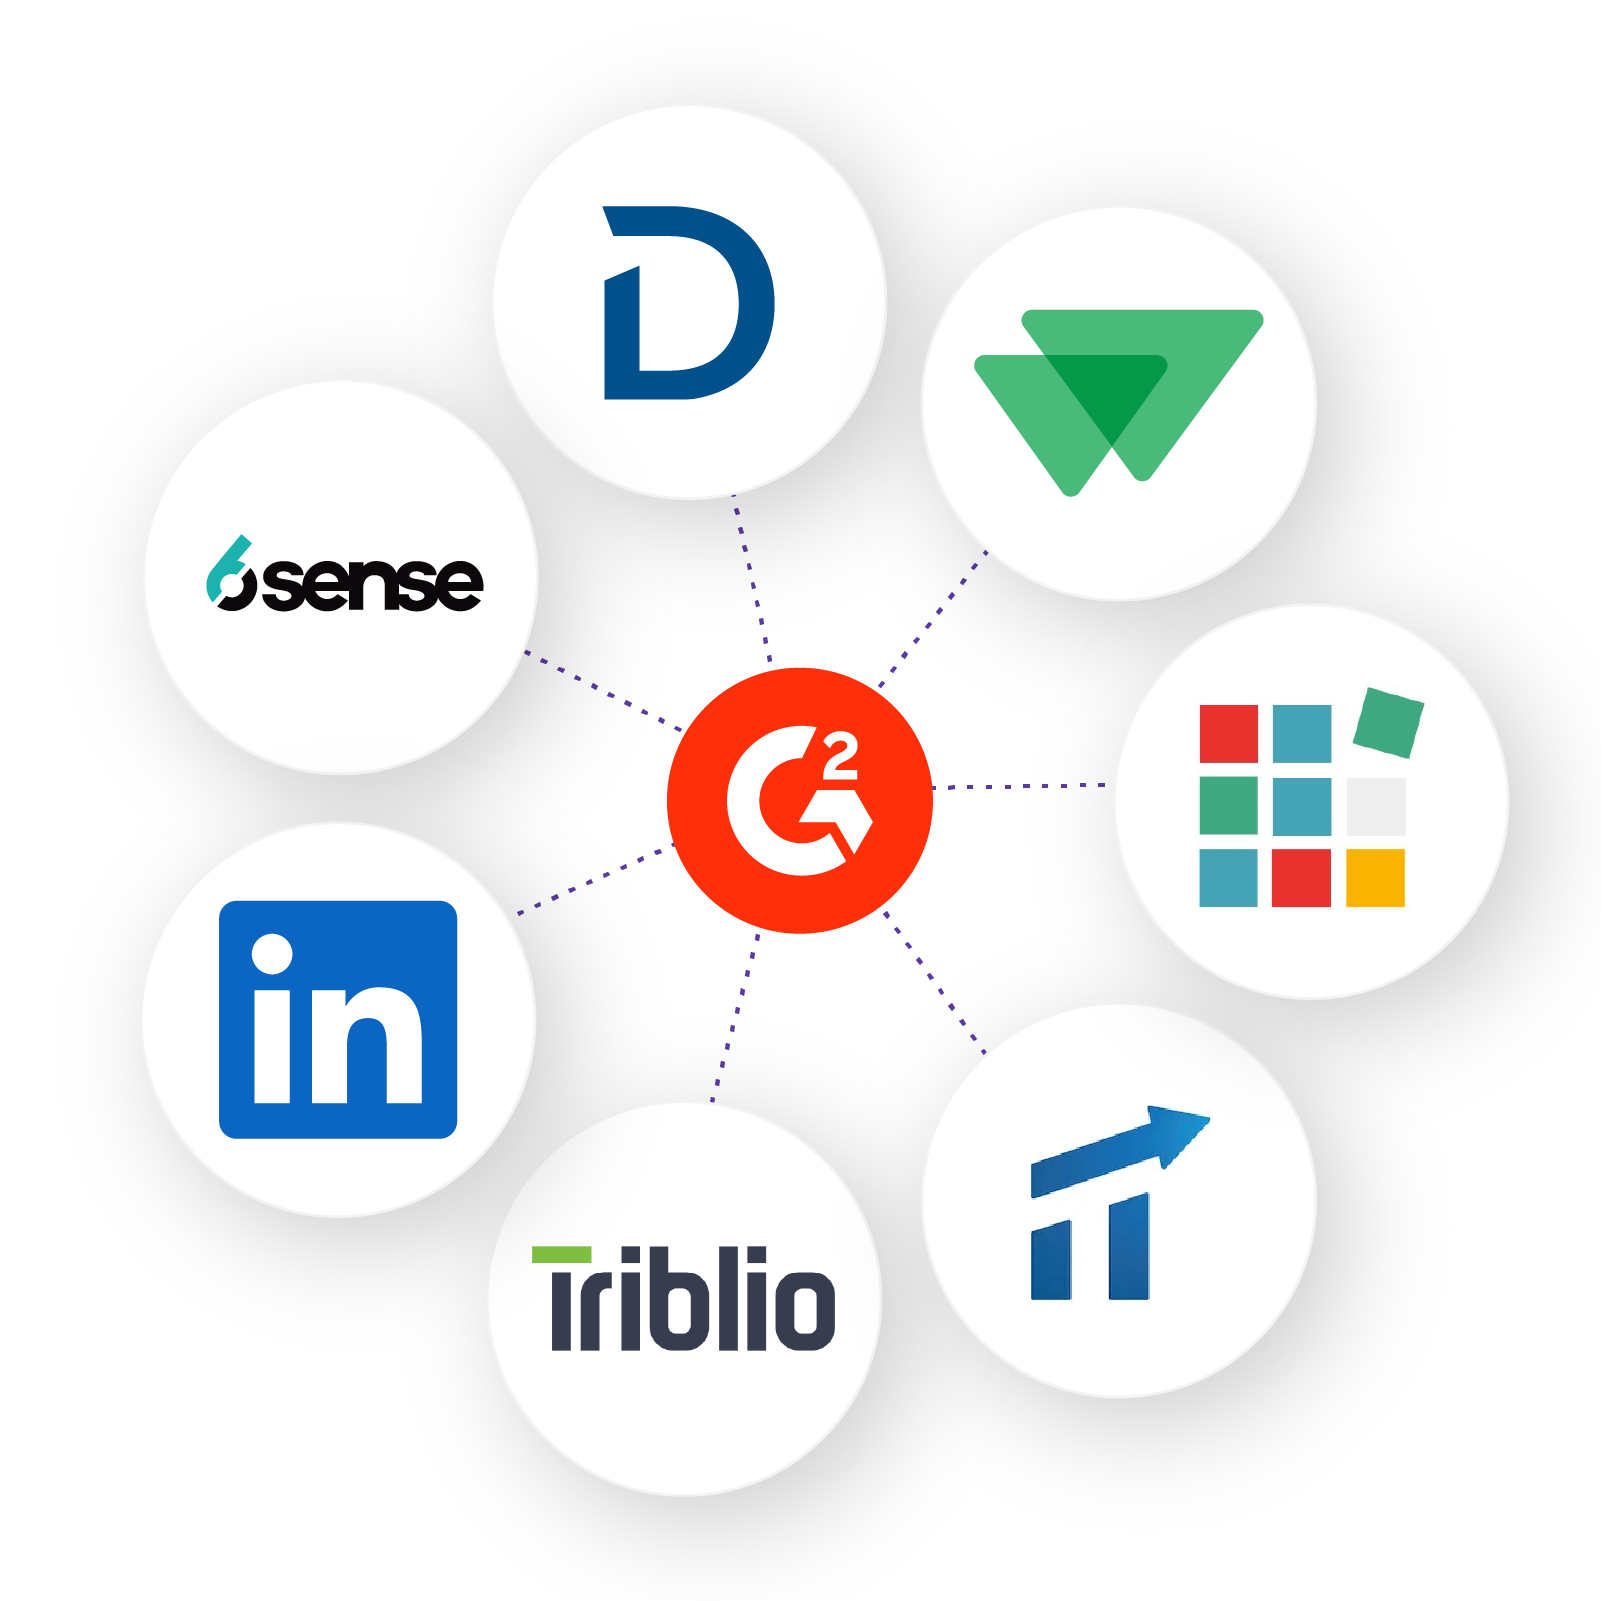 abm-campaign-product-launch-integration-lp-header-v2_1@2x